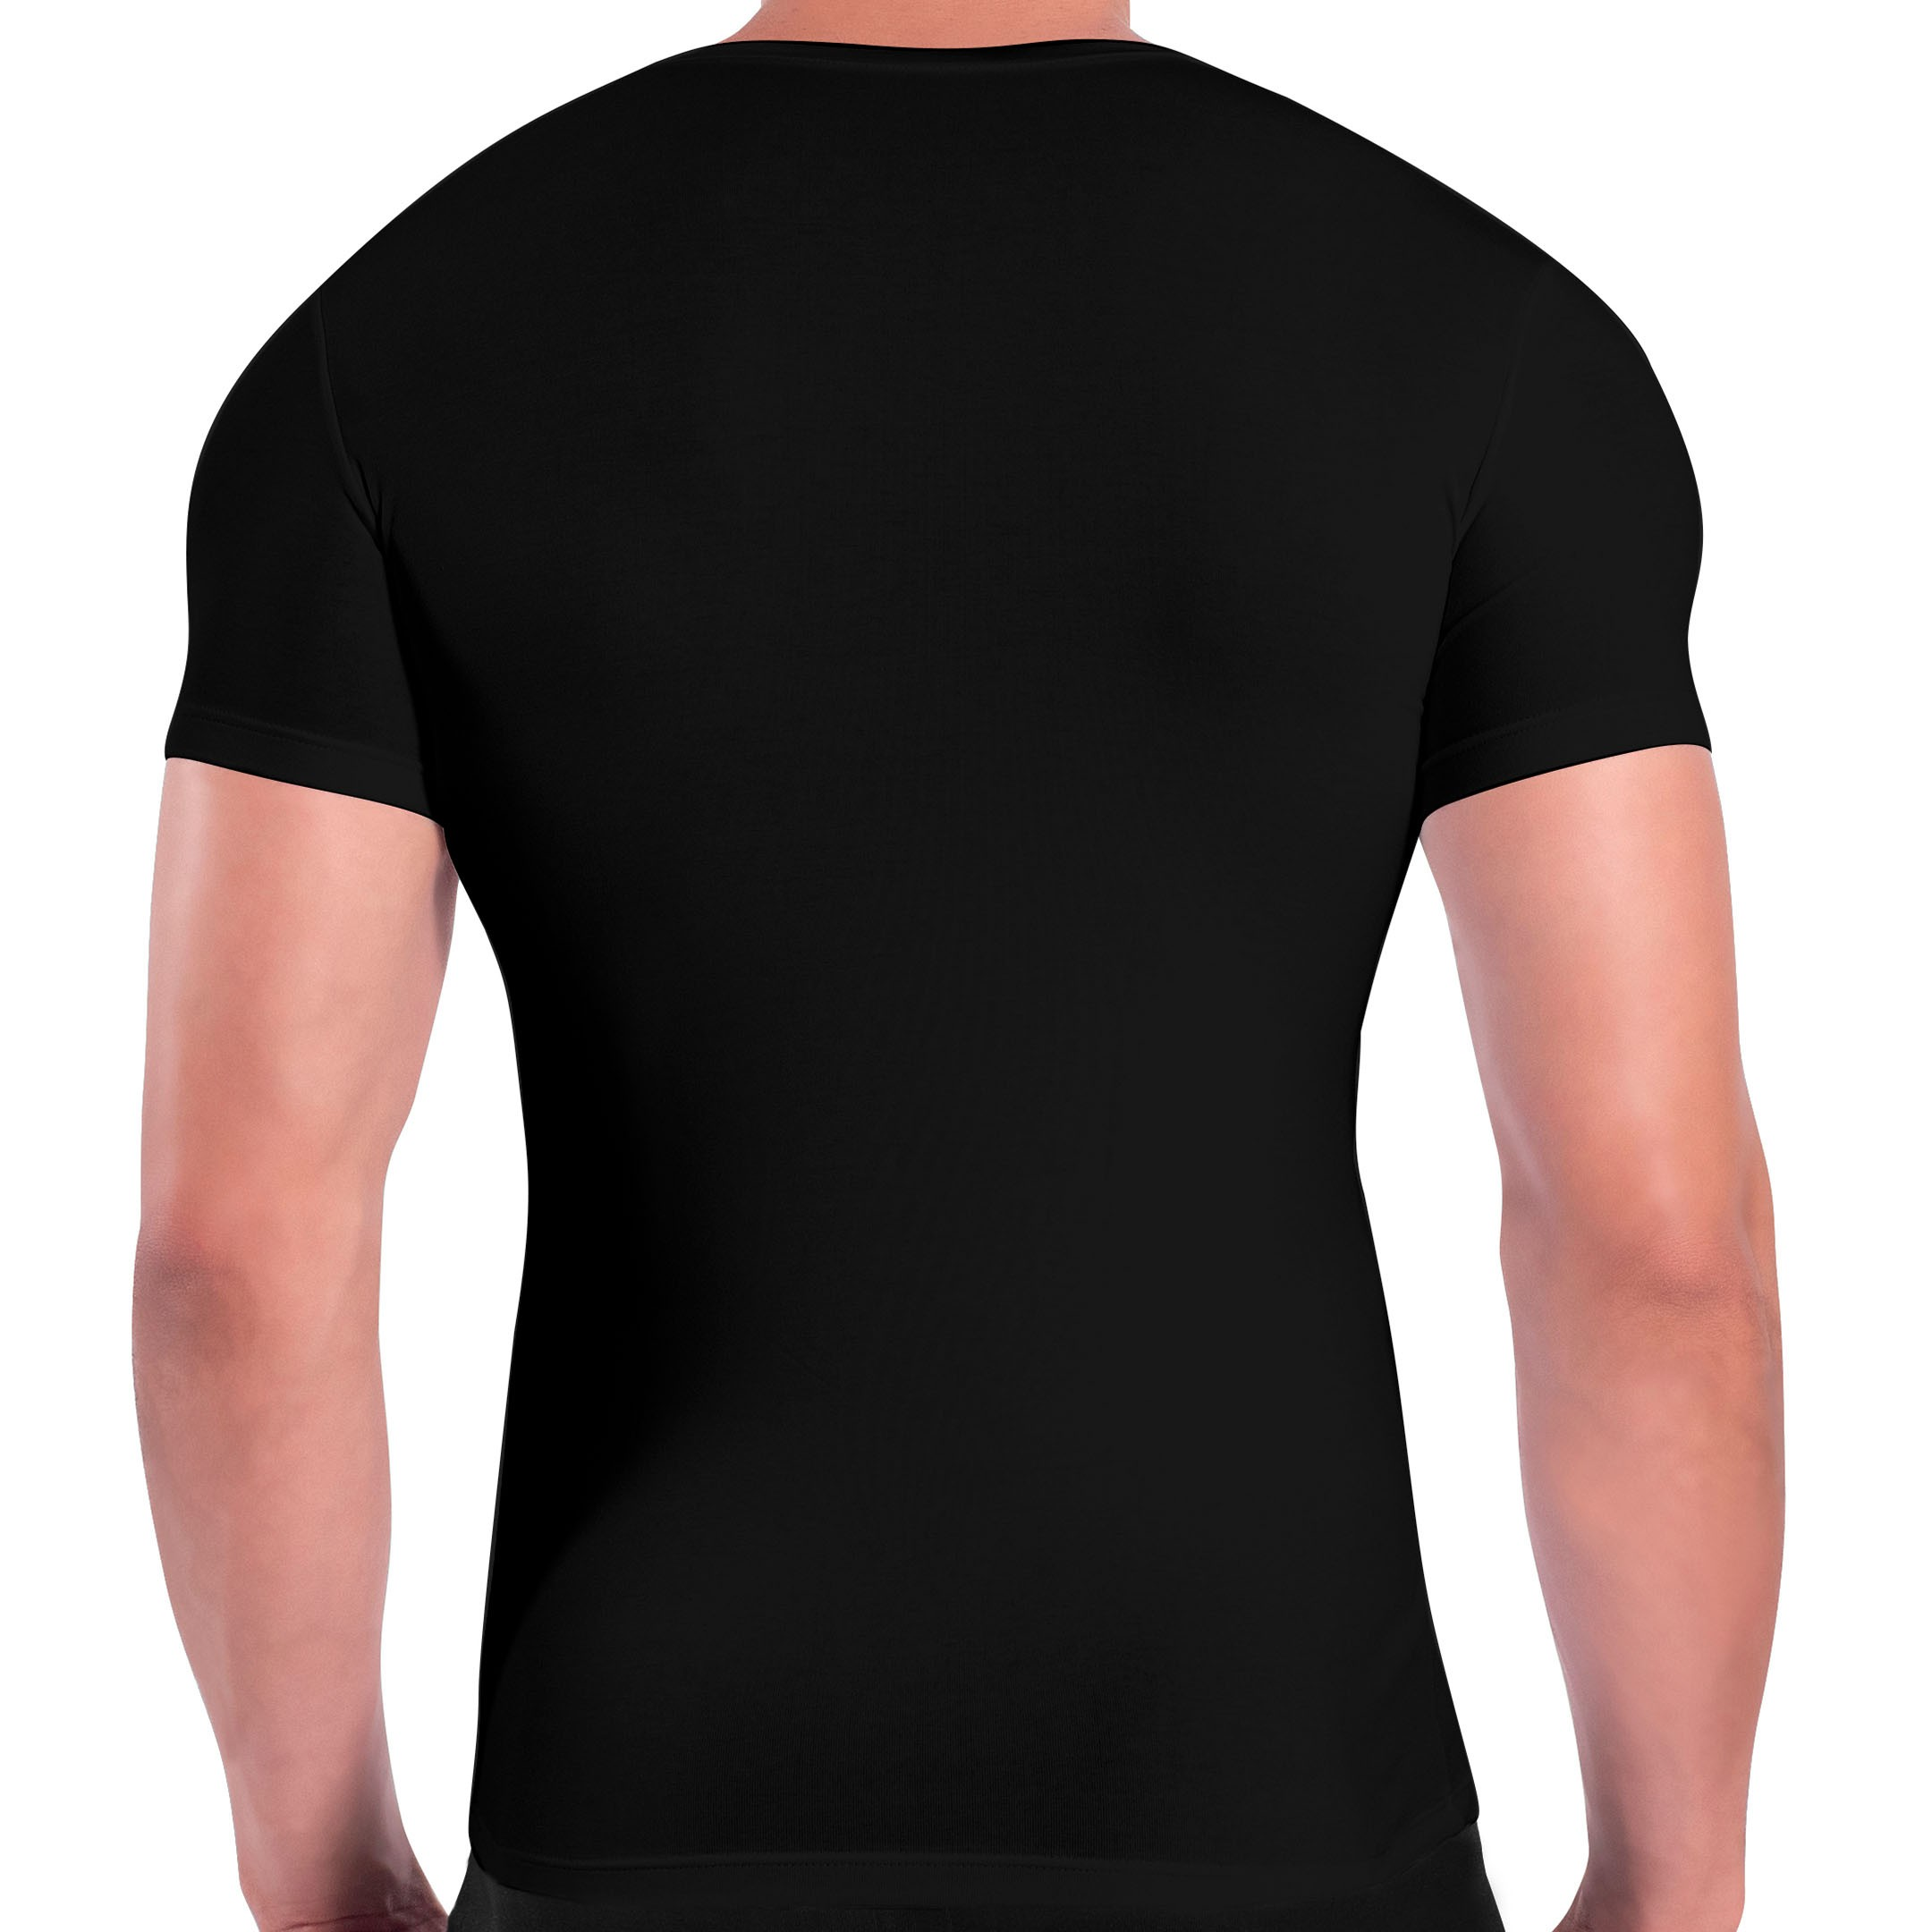 Rounderbum Mens Cotton Compression Tee Shirt